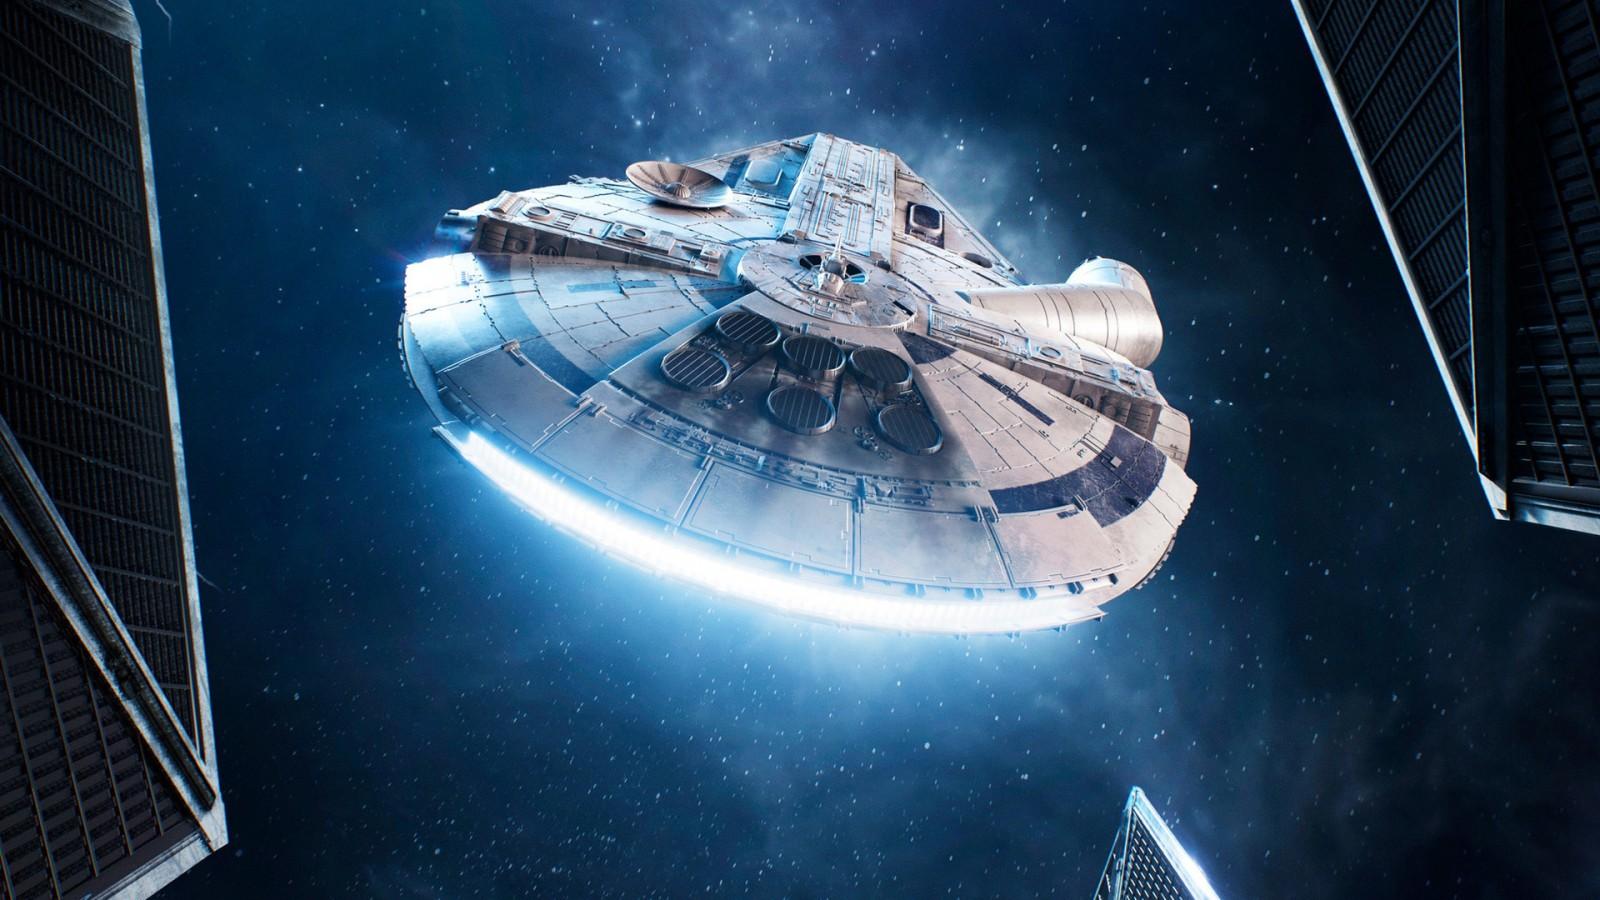 Star Wars Supremacy Ship